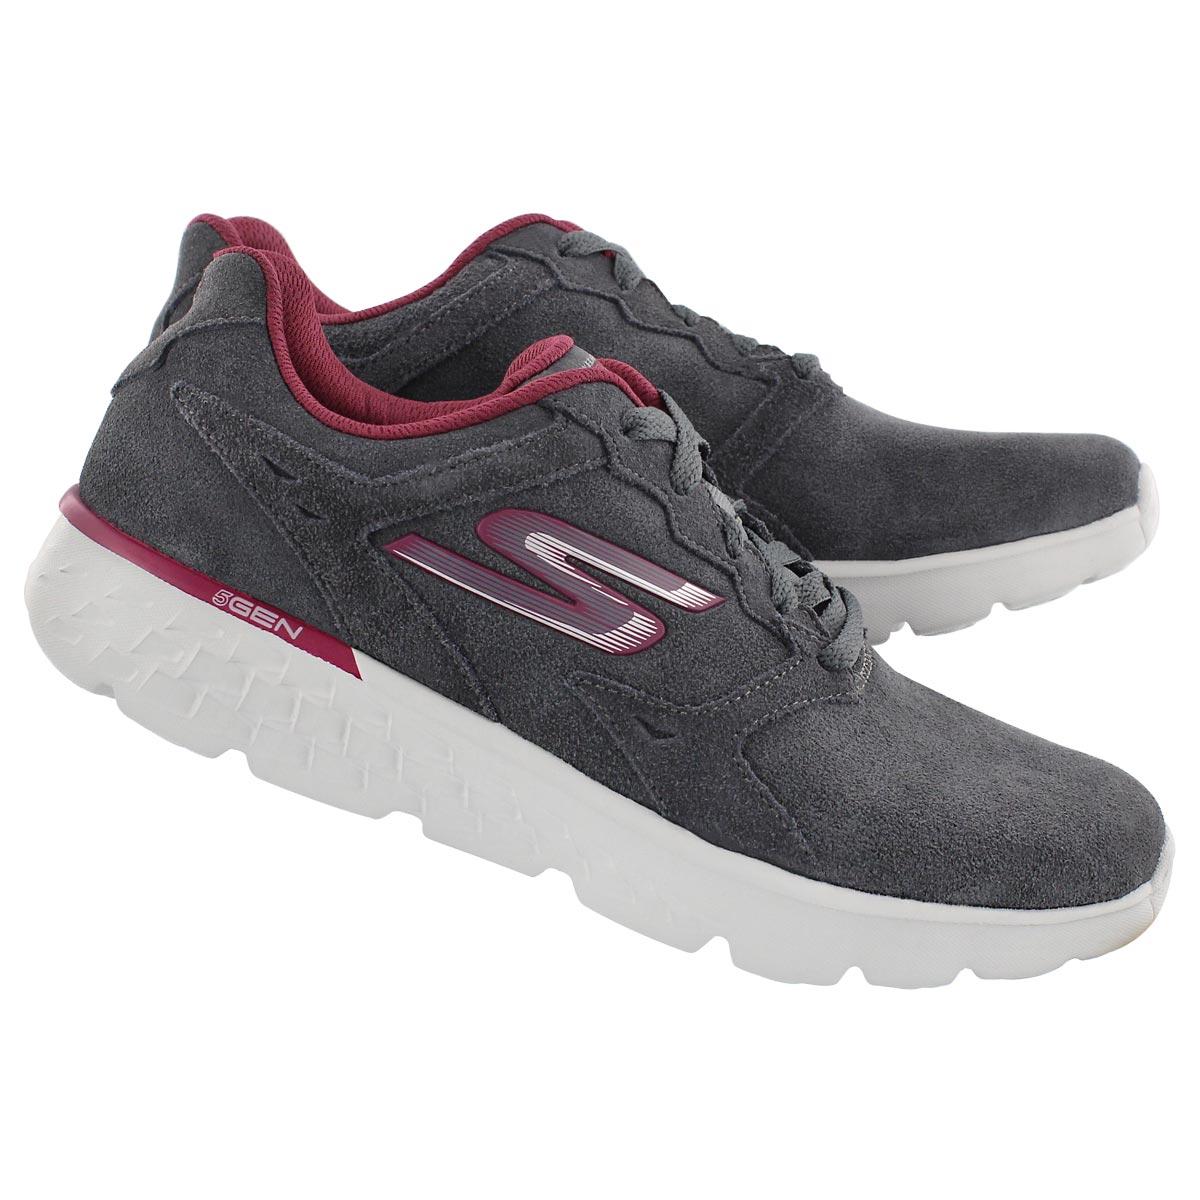 Lds GOrun 400 char lace up running shoe